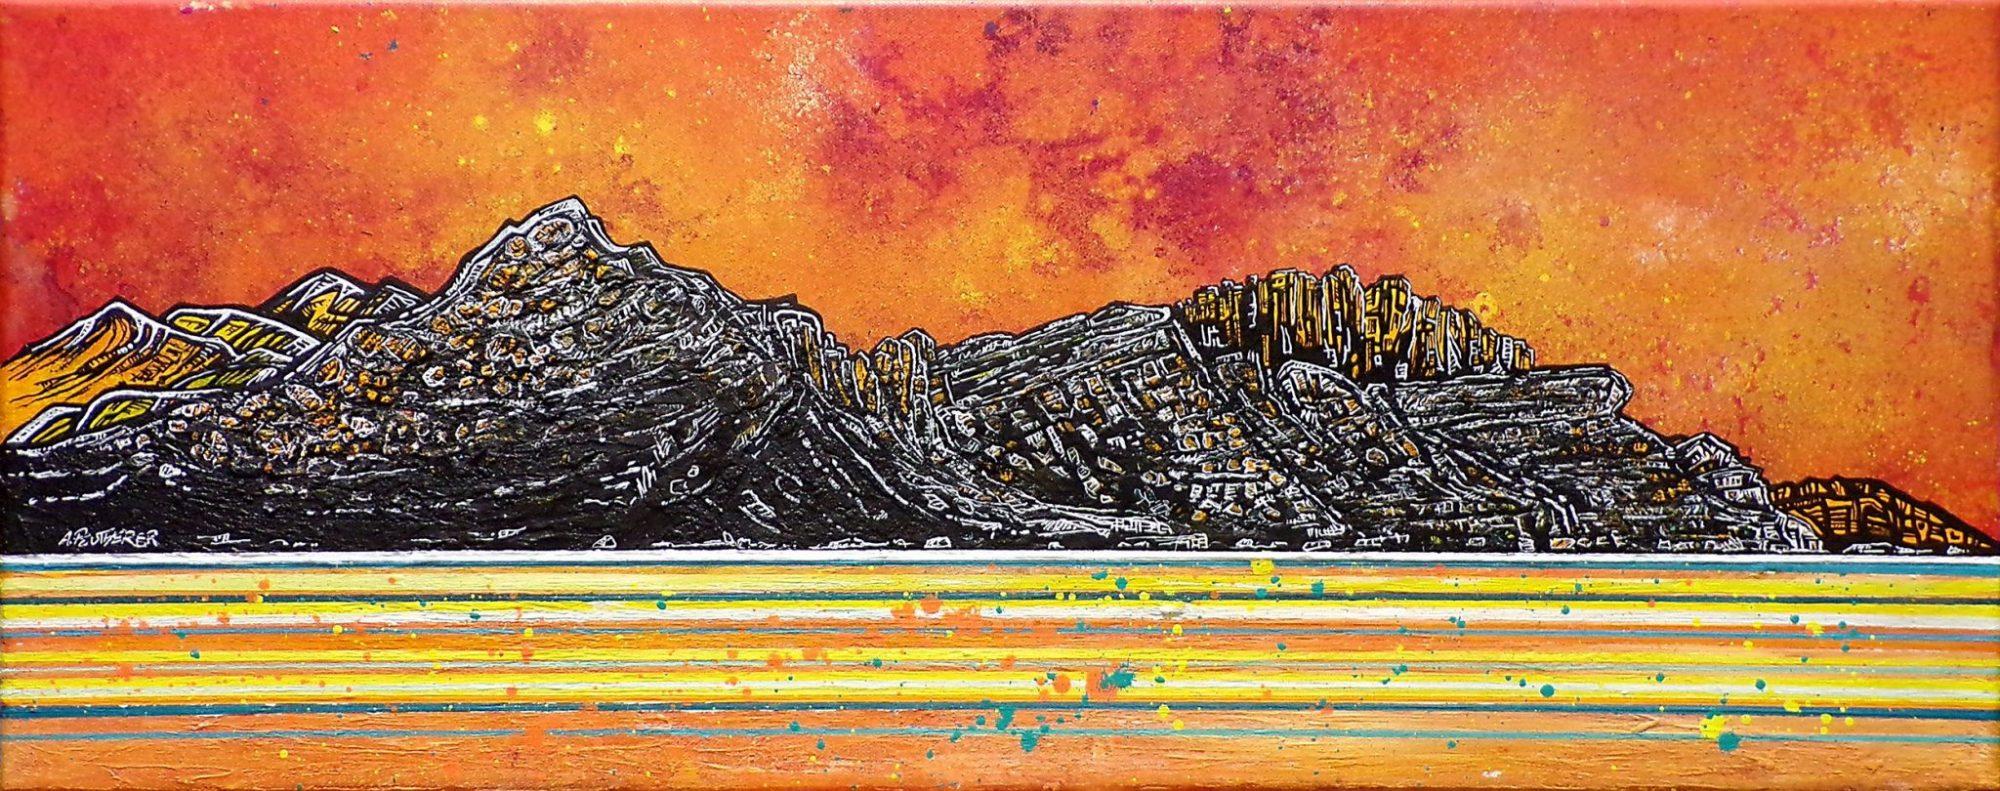 Trotternish Ridge, Near Sconser, Skye - Original painting and prints